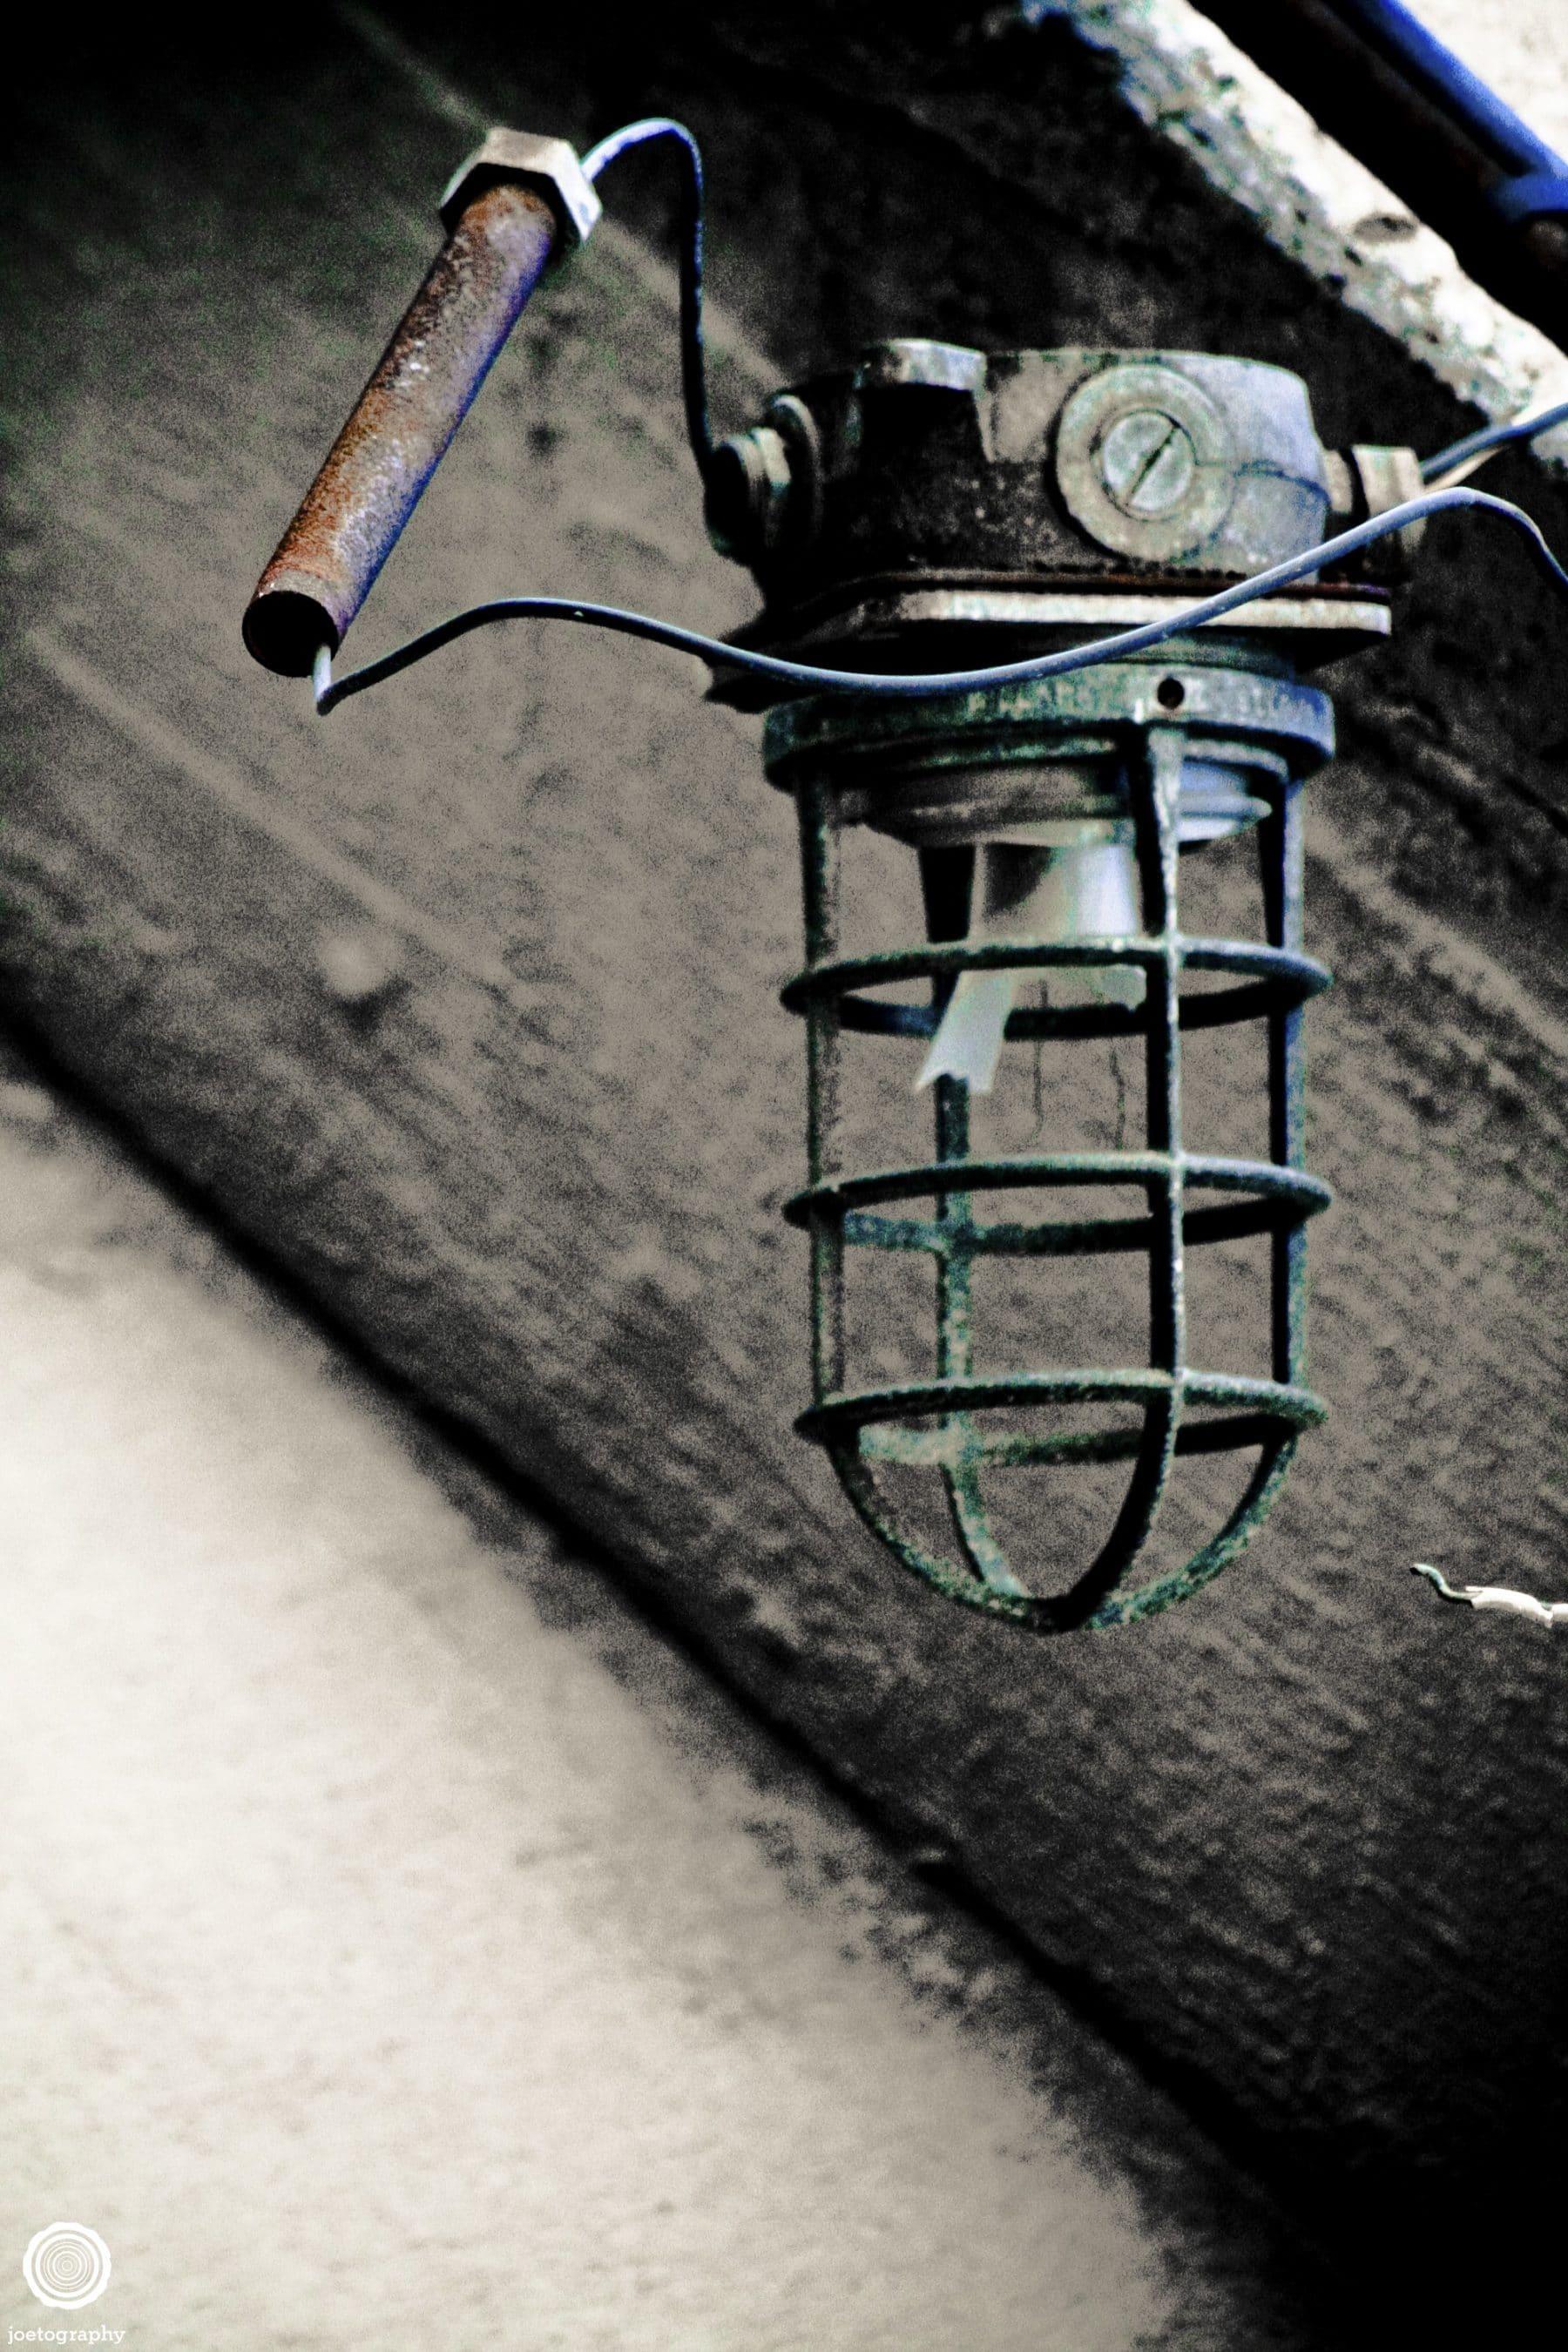 Urban-Photography-Indianapolis-Indiana-6